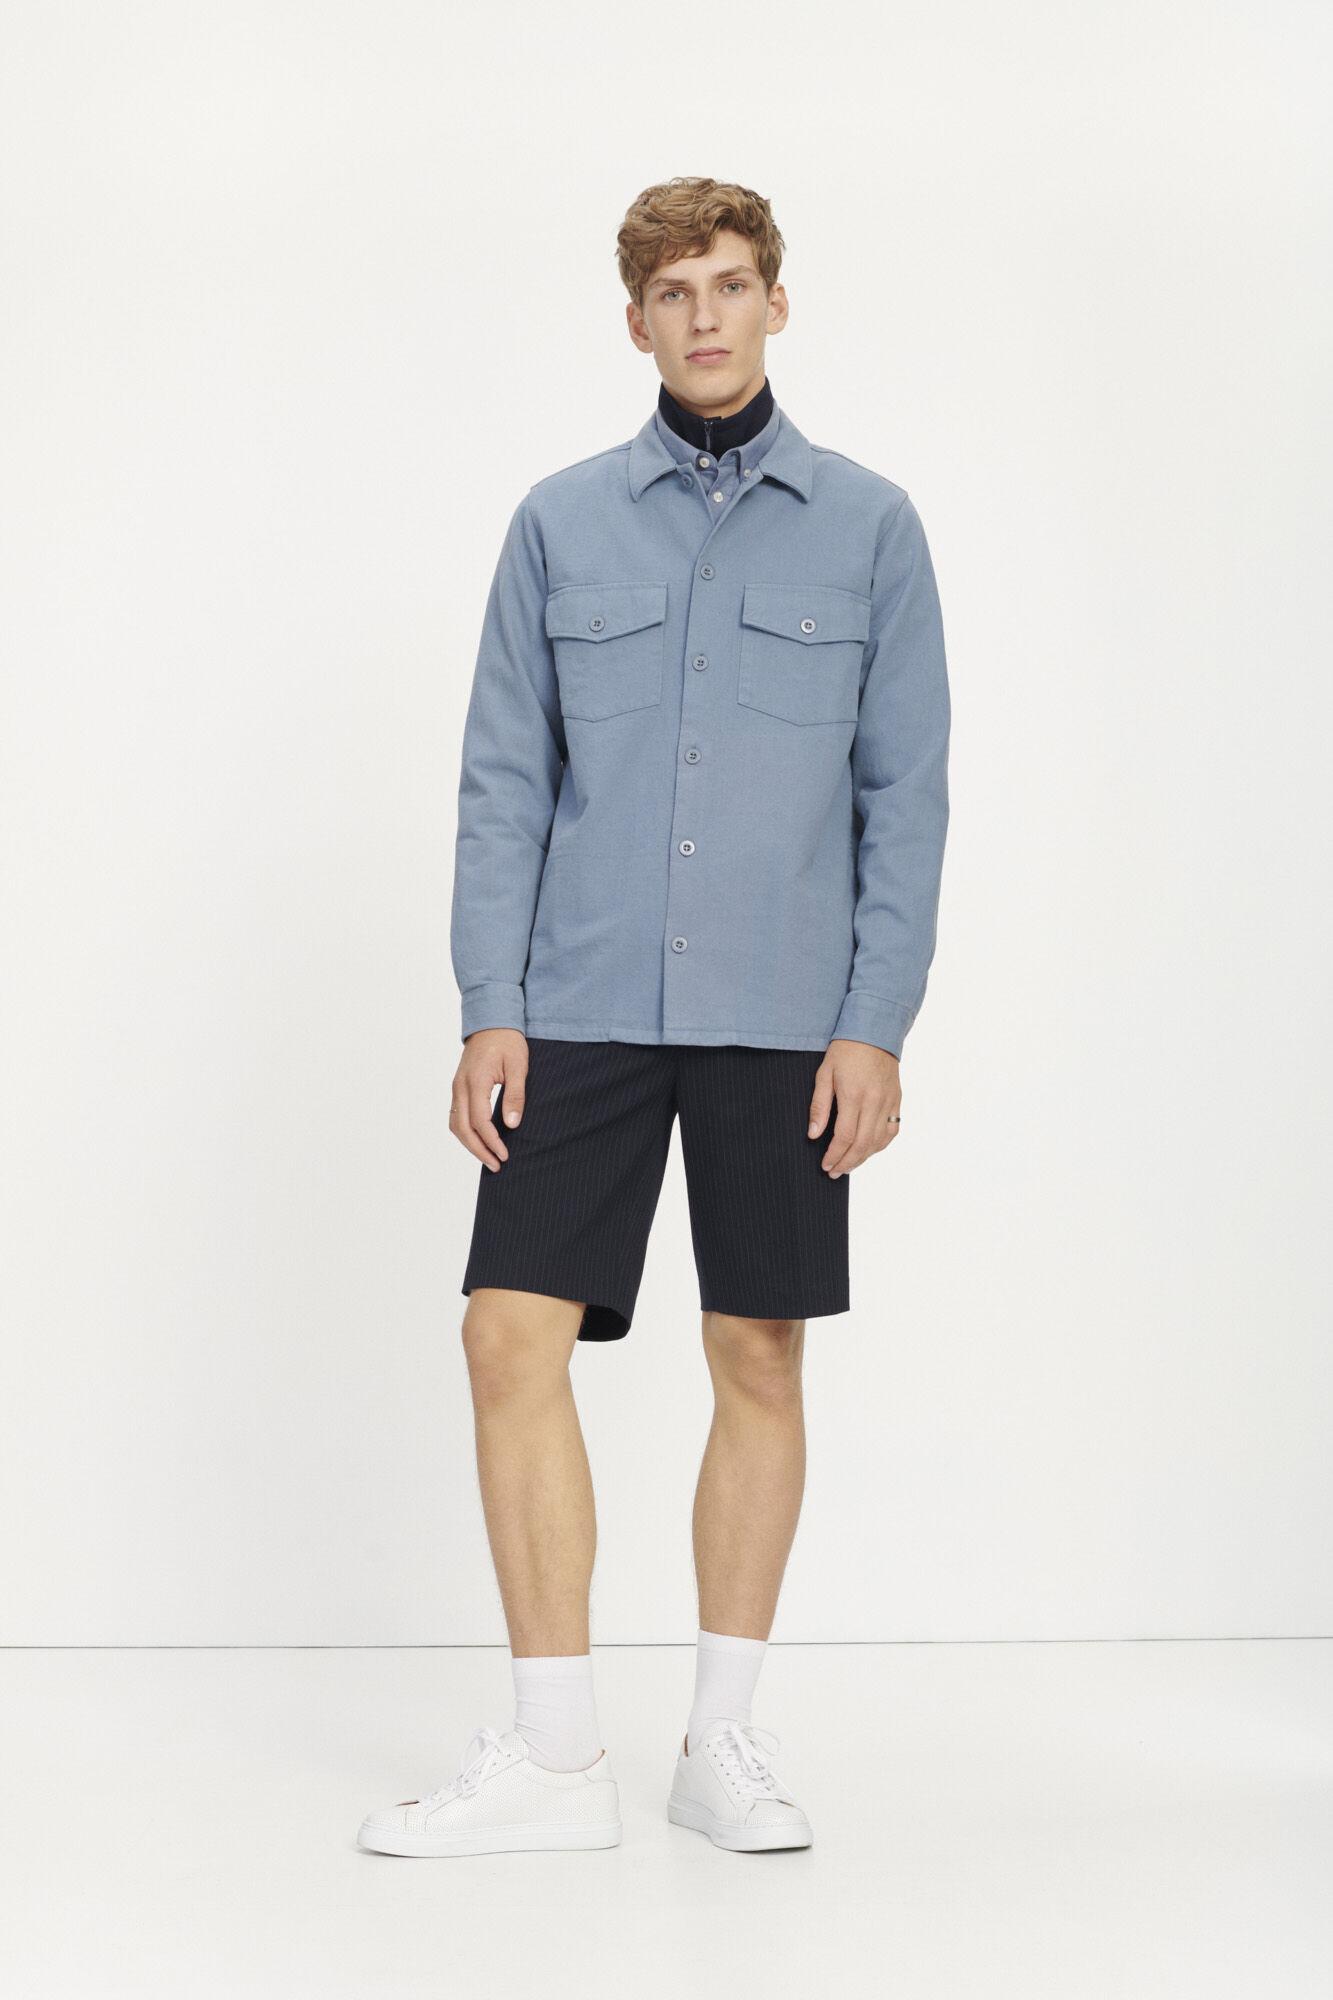 Luccas N shirt 11383